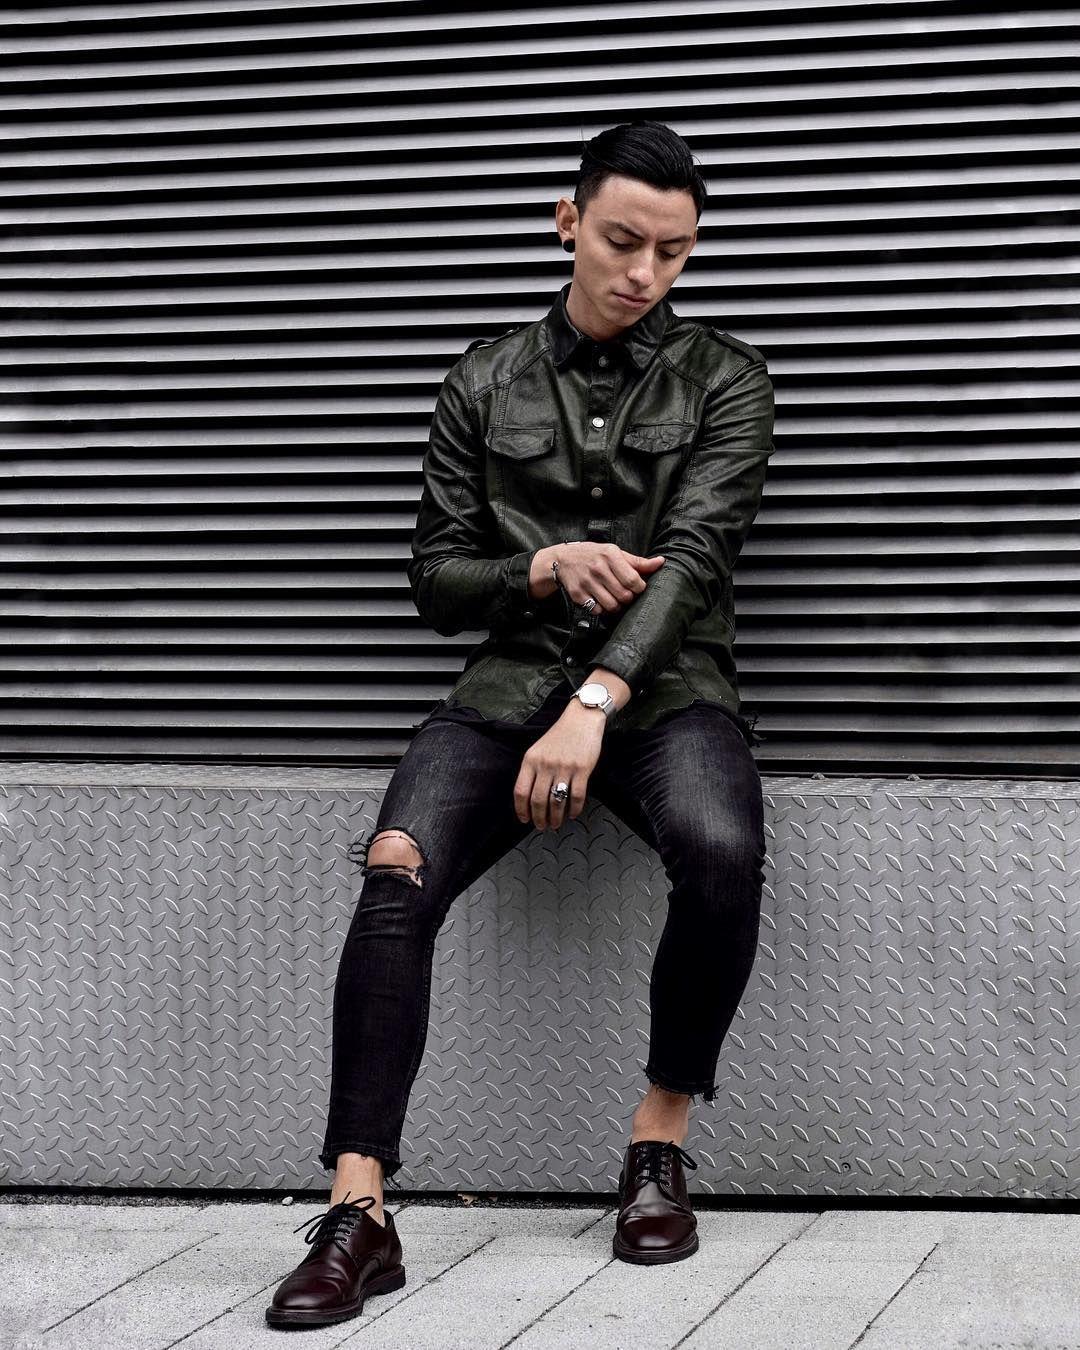 likes comments pepé fashion enthusiast soyraka on